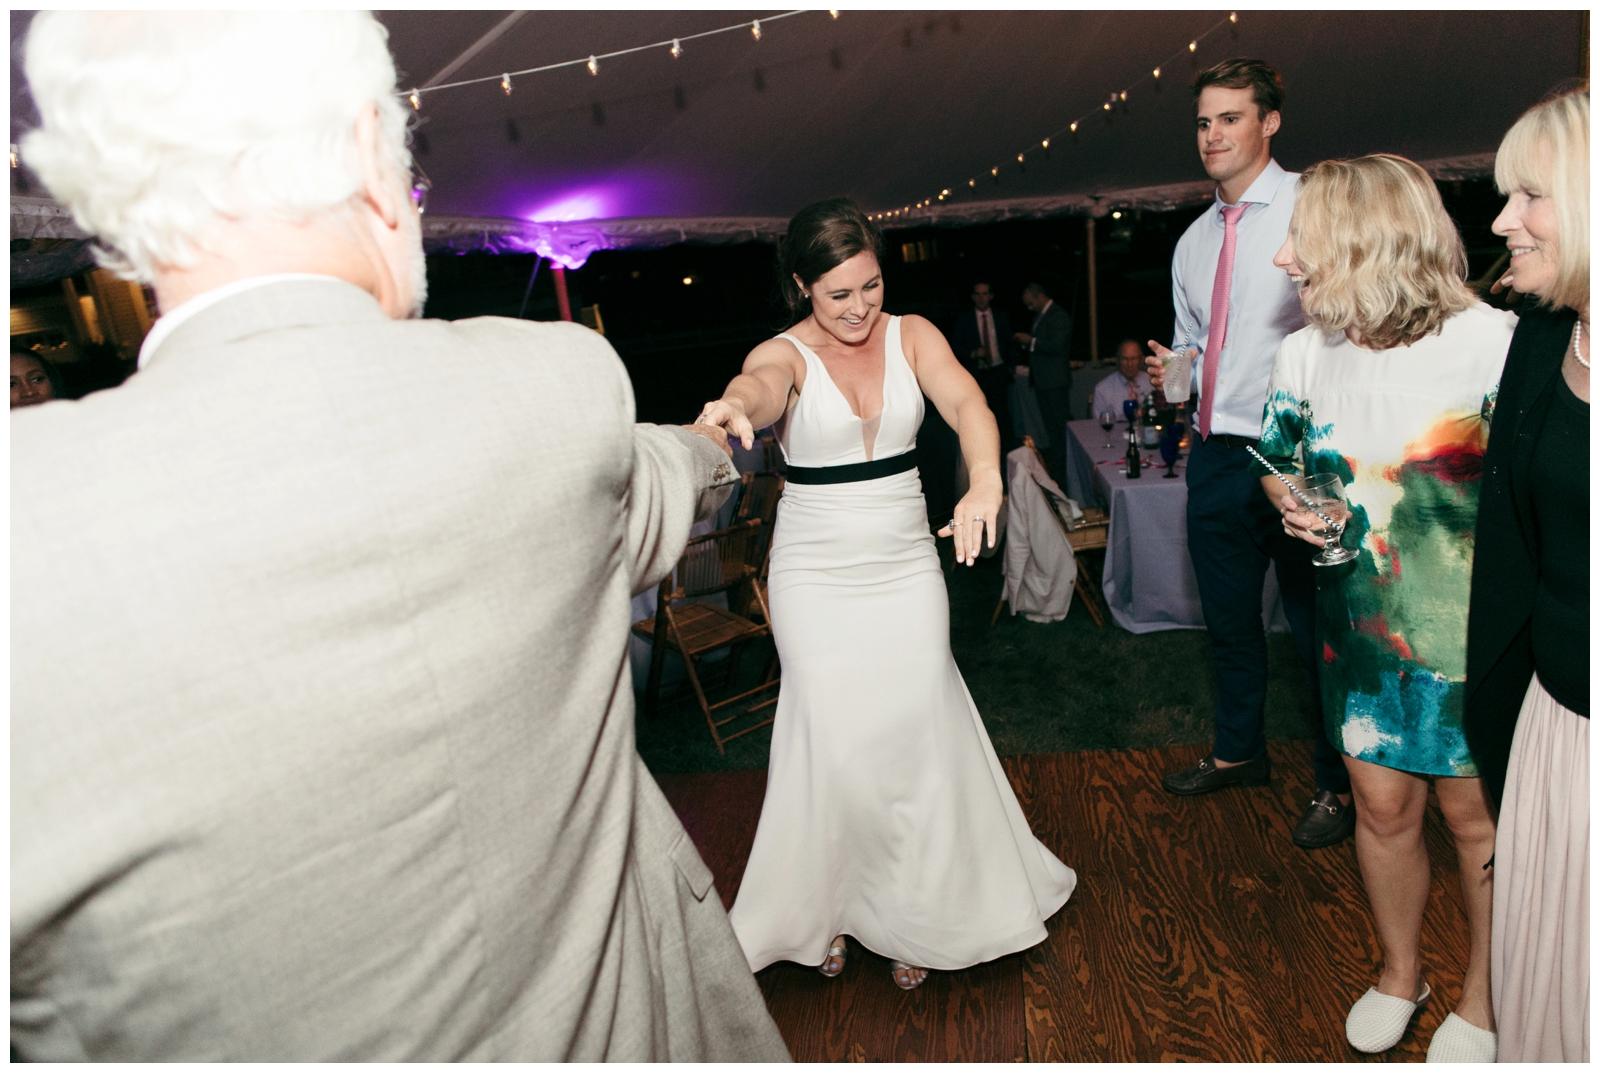 Bailey-Q-Photo-Backyard-Wedding-South-Shore-Boston-Wedding-Photographer-149.jpg